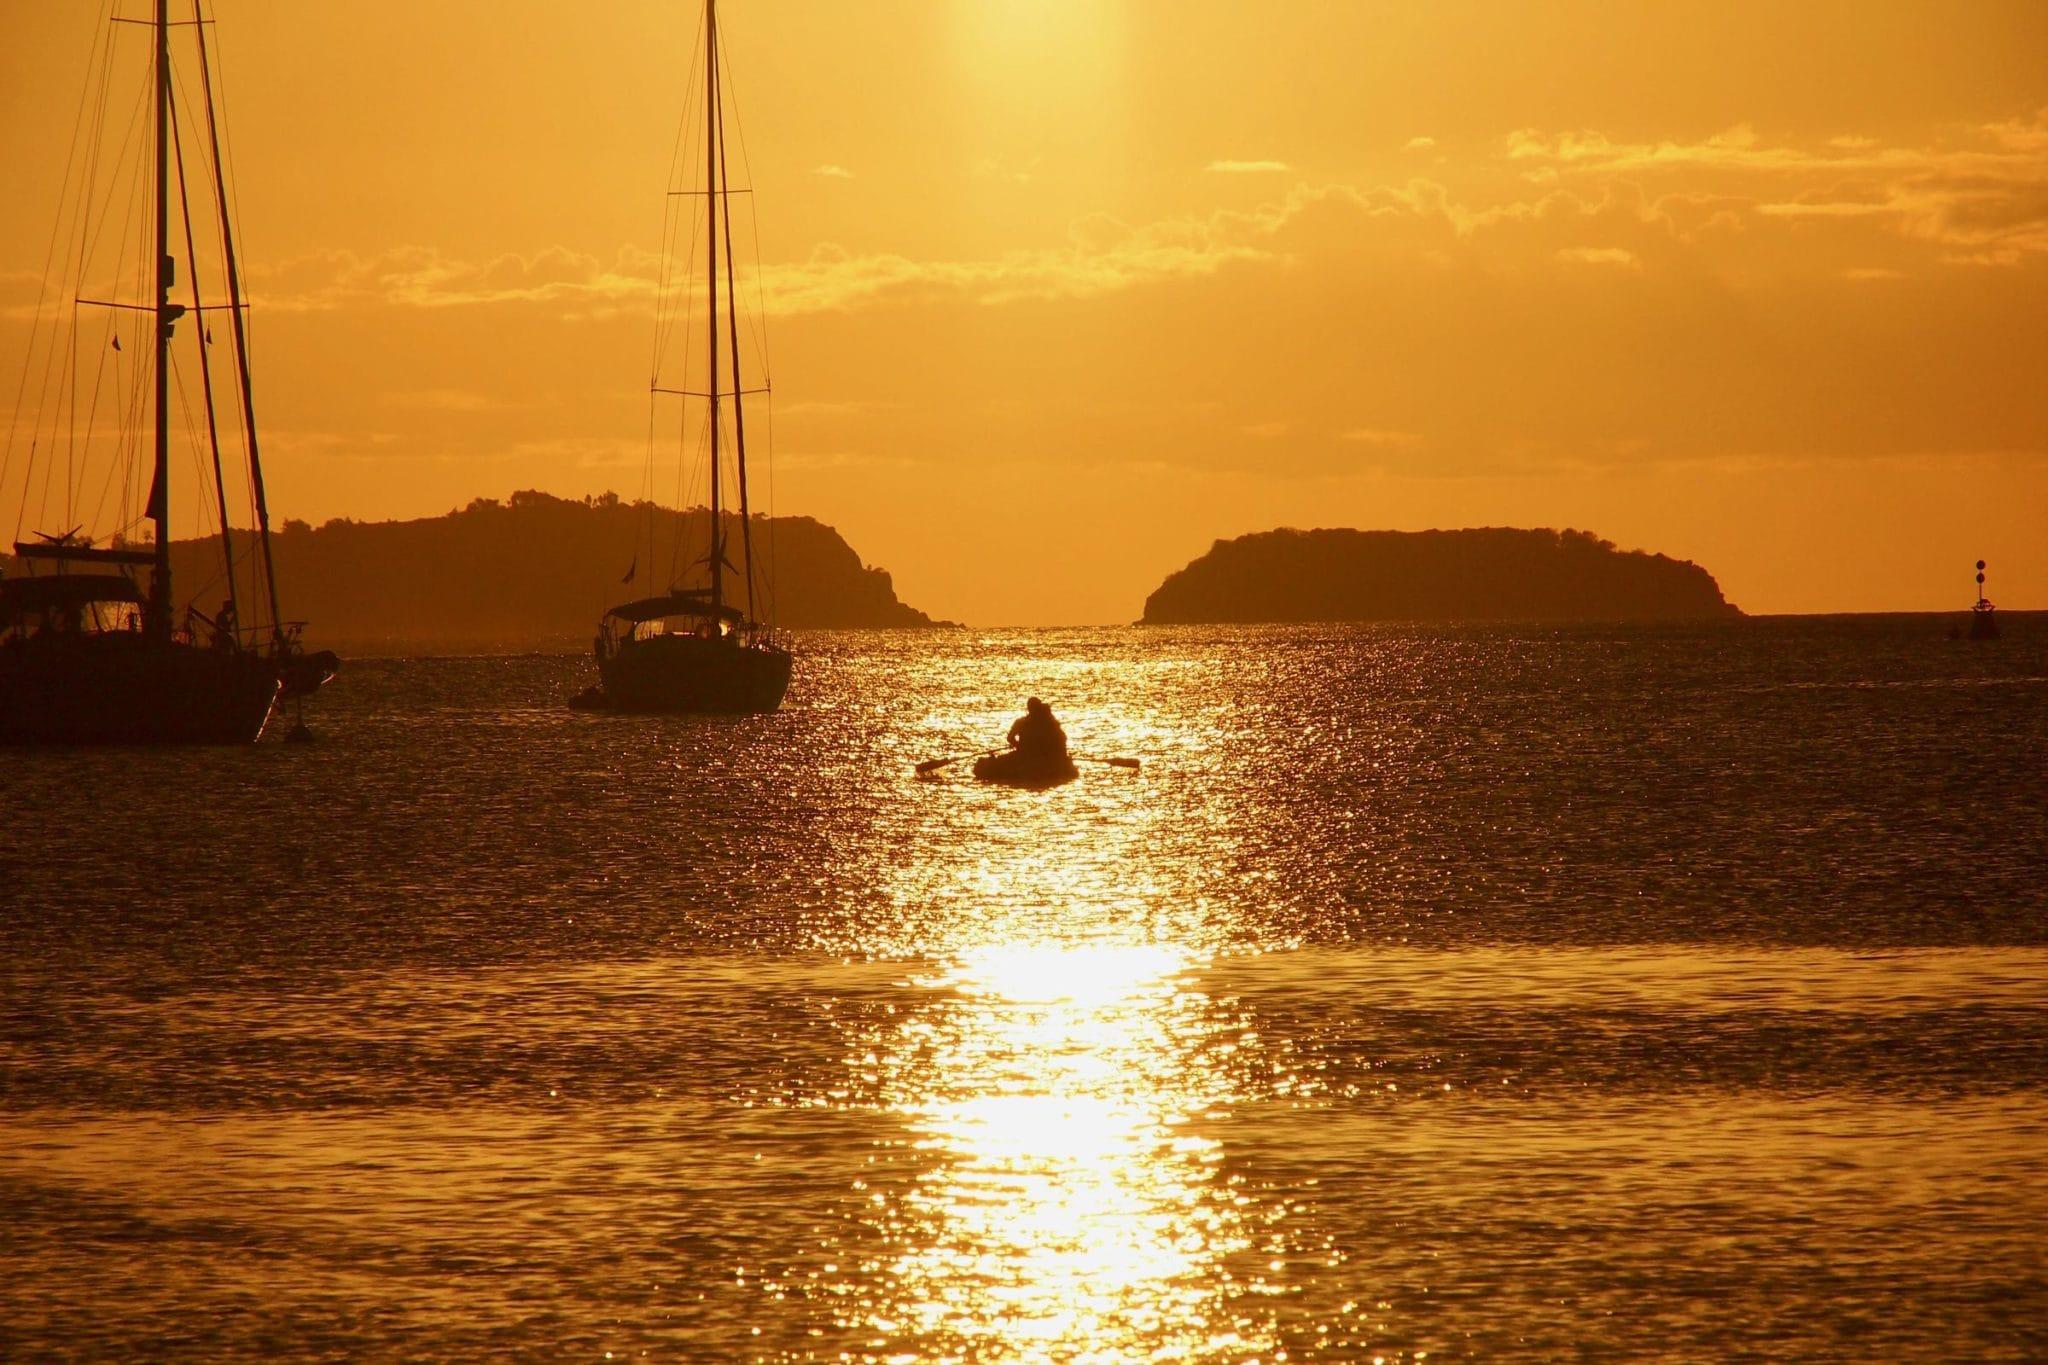 Sunset Cruising in Terre-de-Haut, Guadeloupe